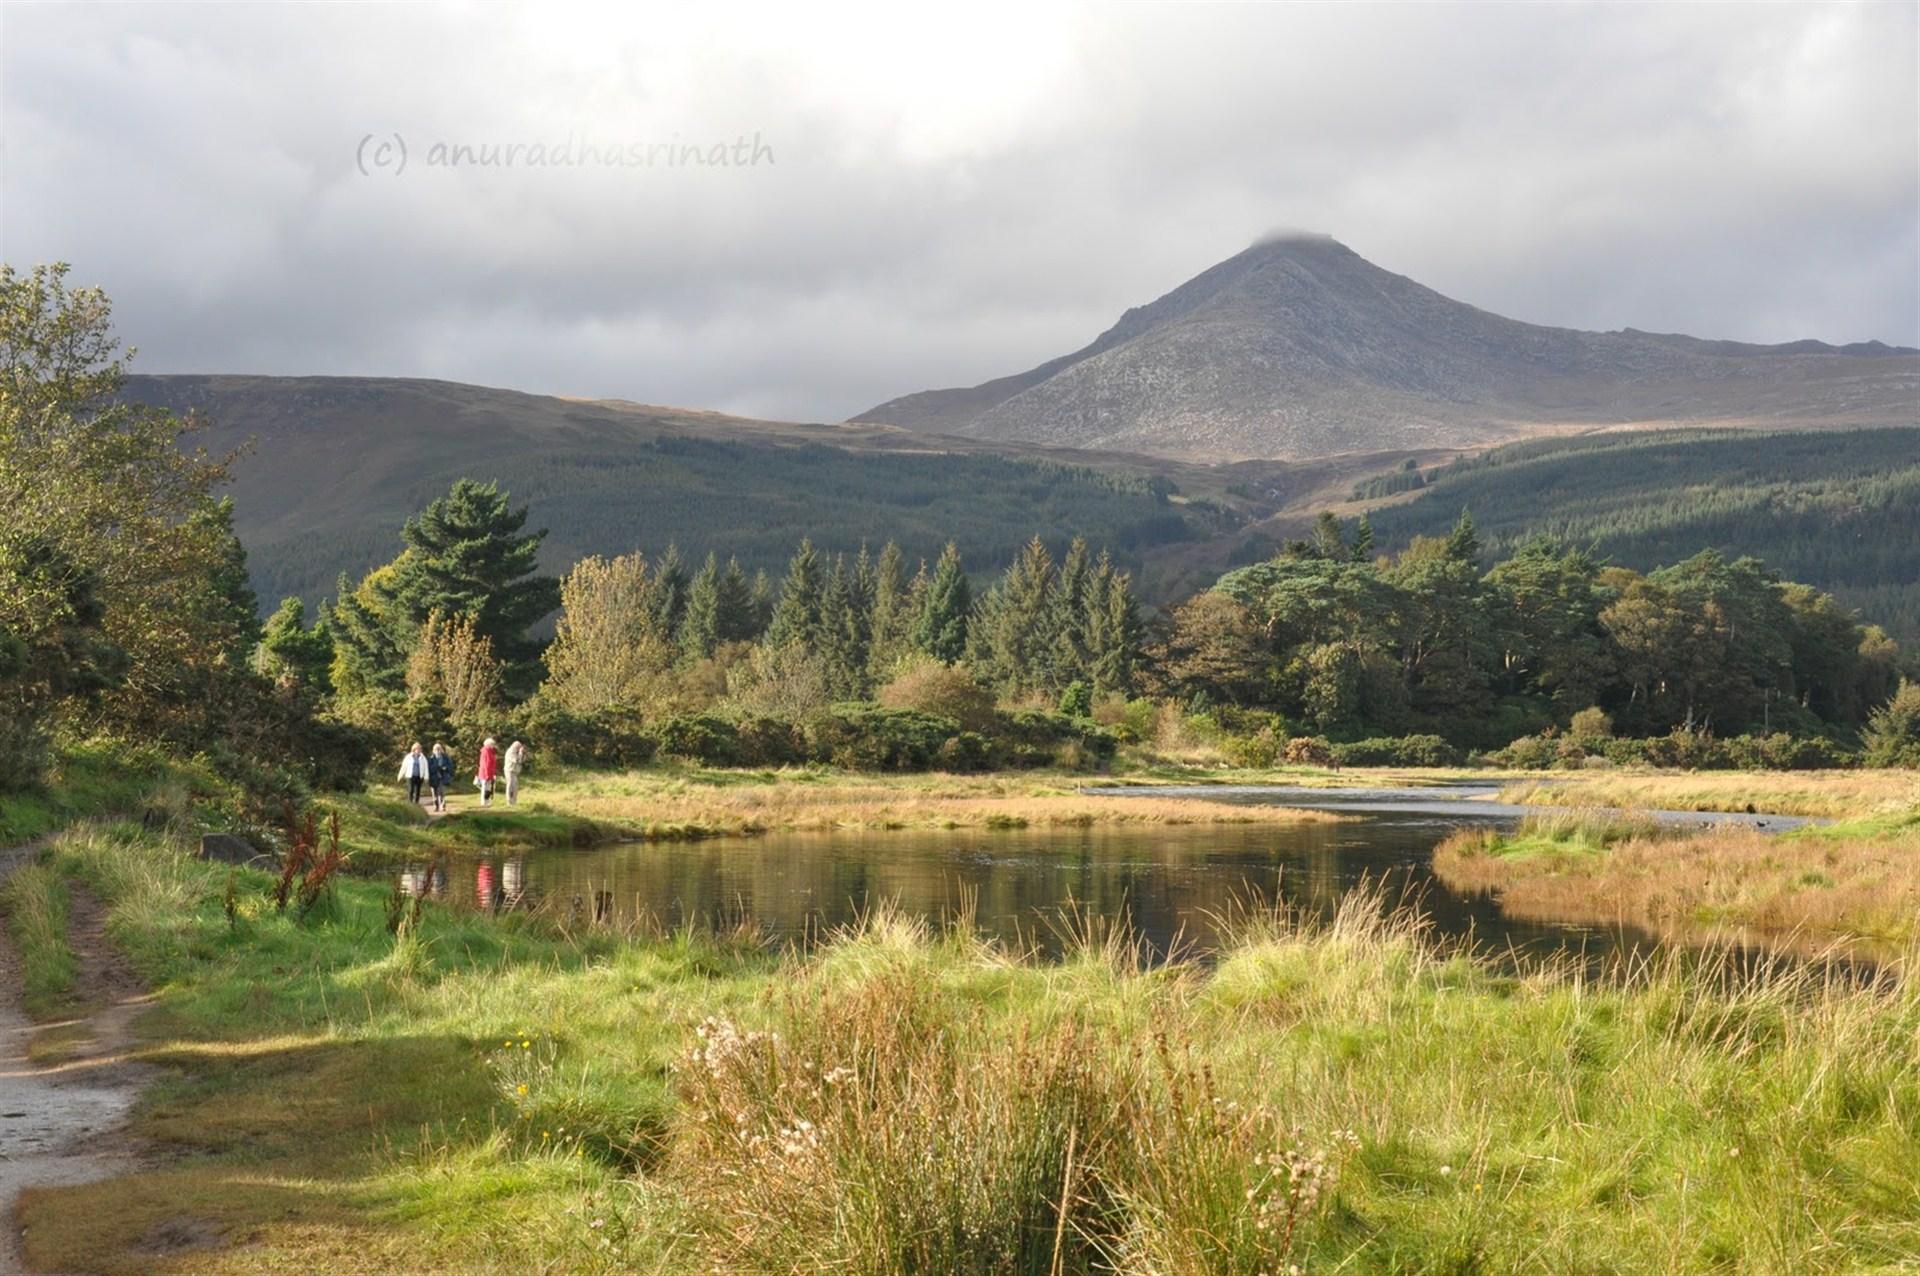 Goatfell mountain and brodick_1920x1276